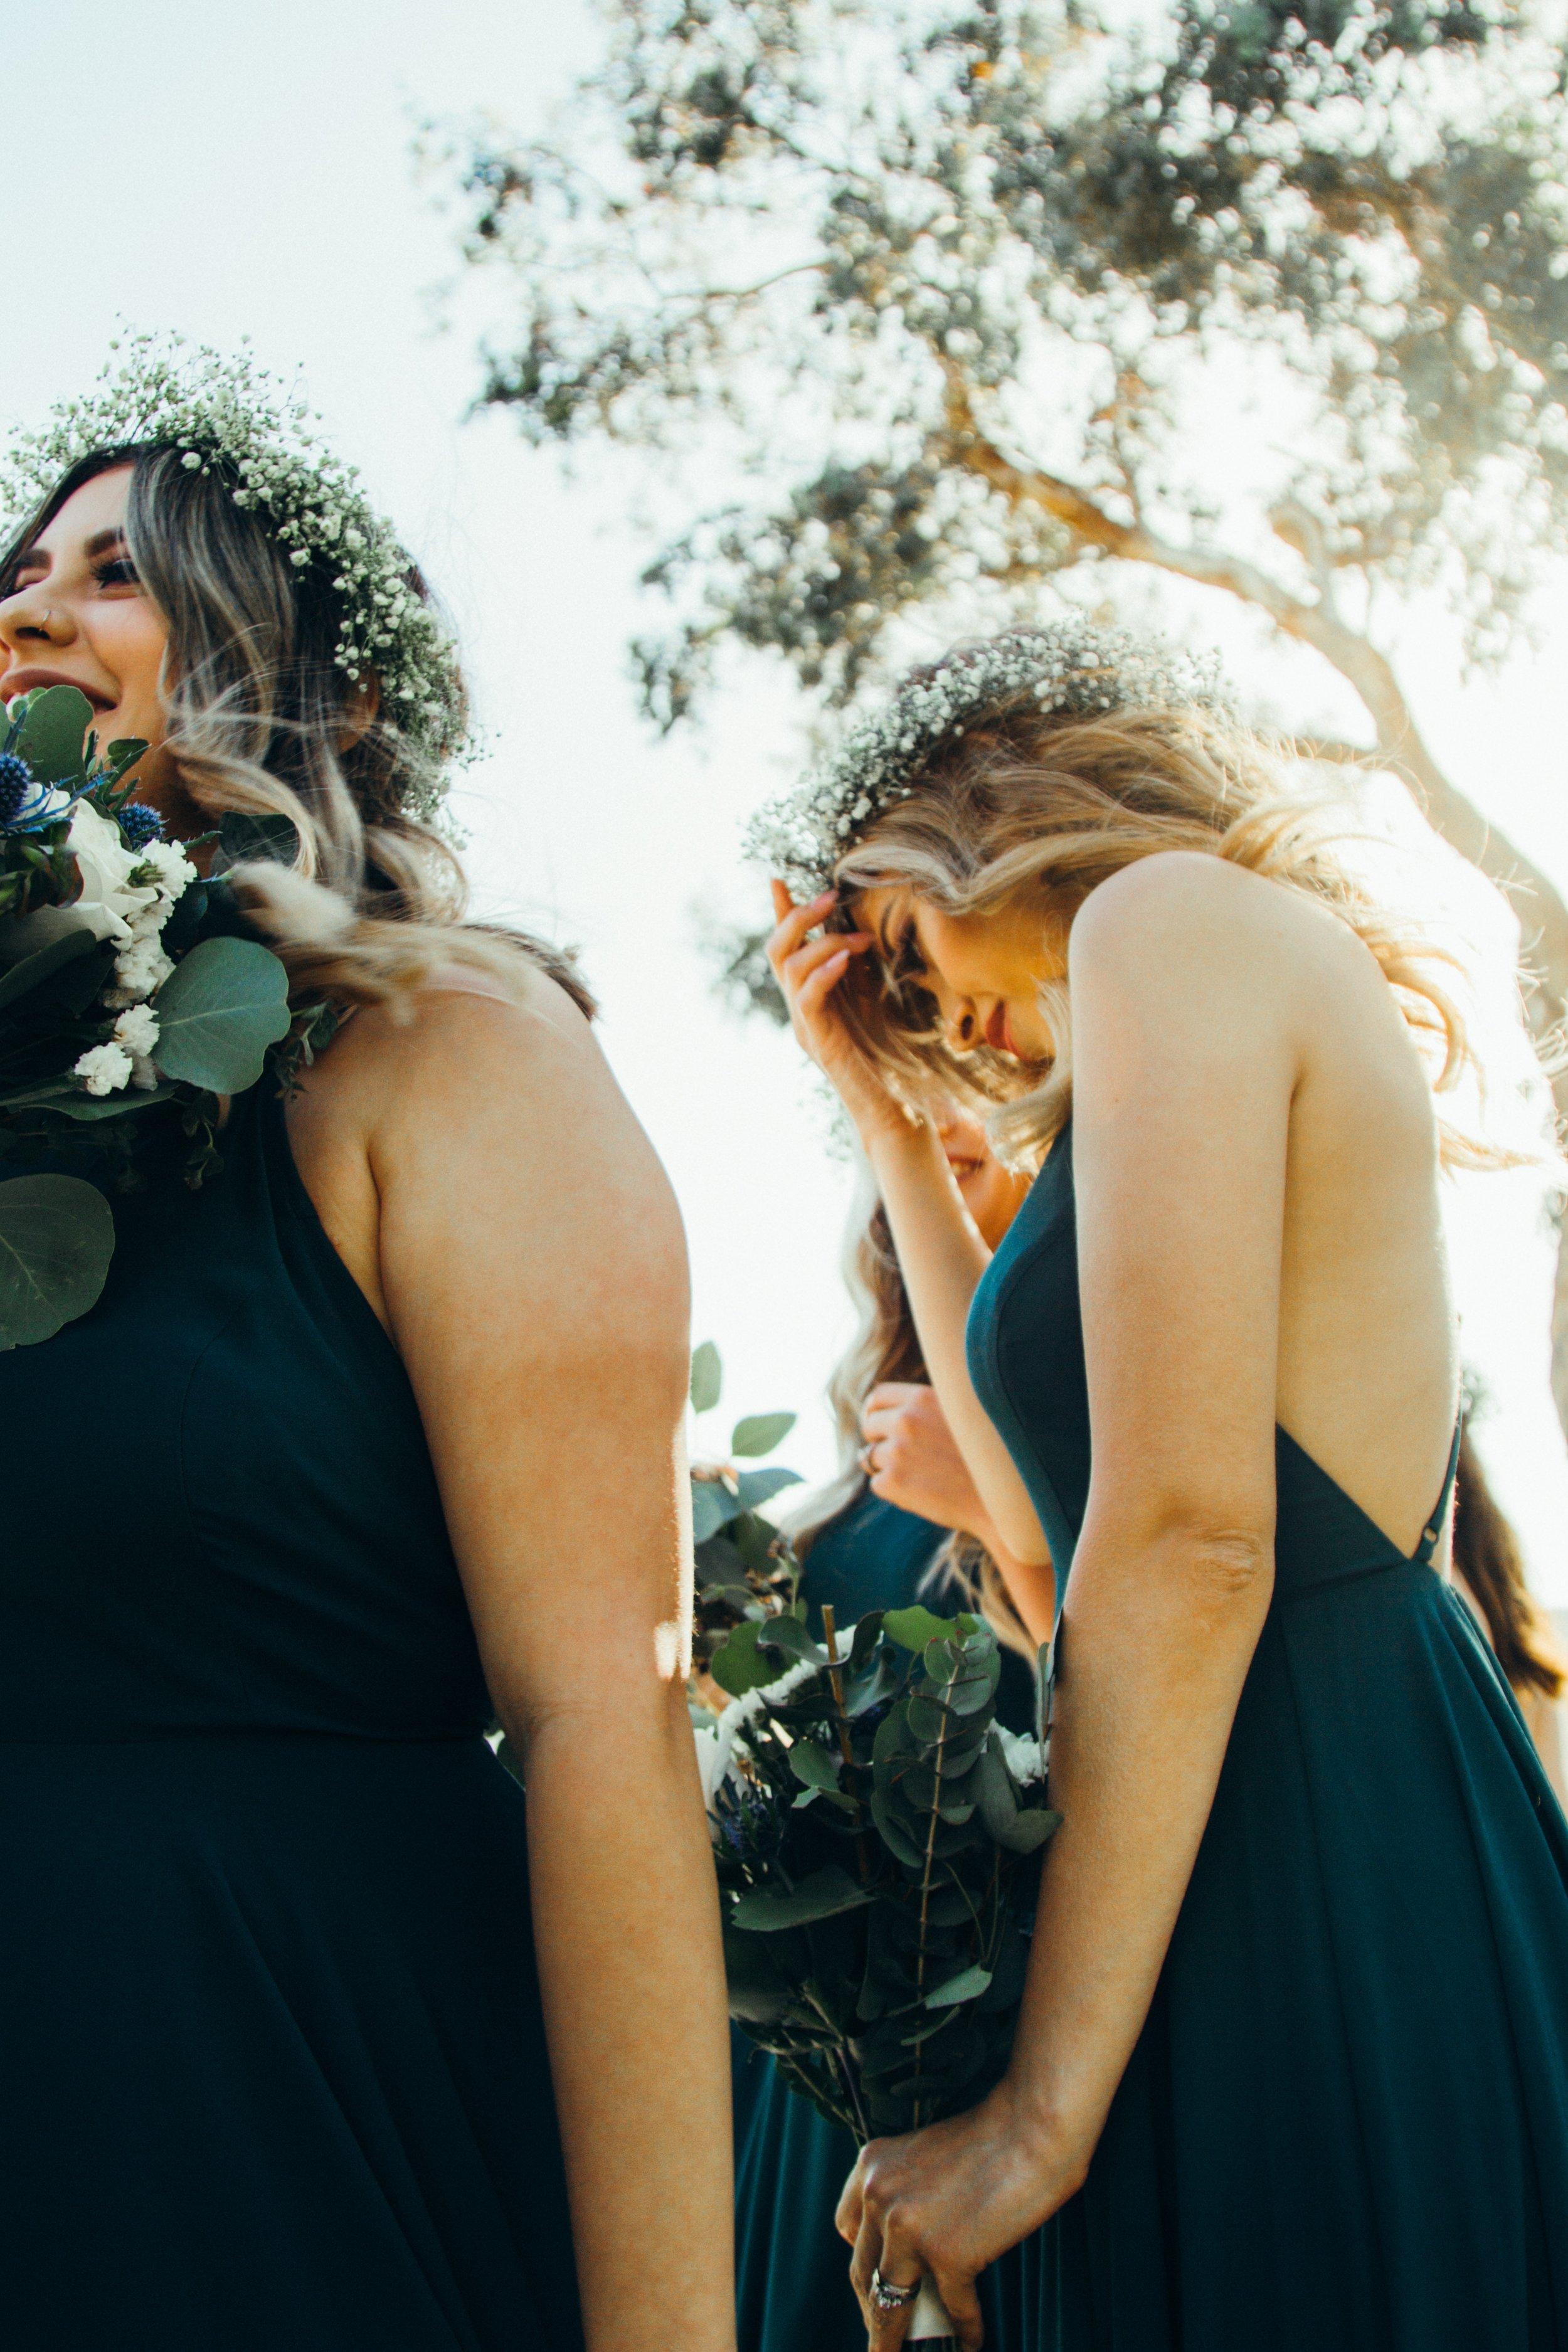 bridesmaid01.jpg